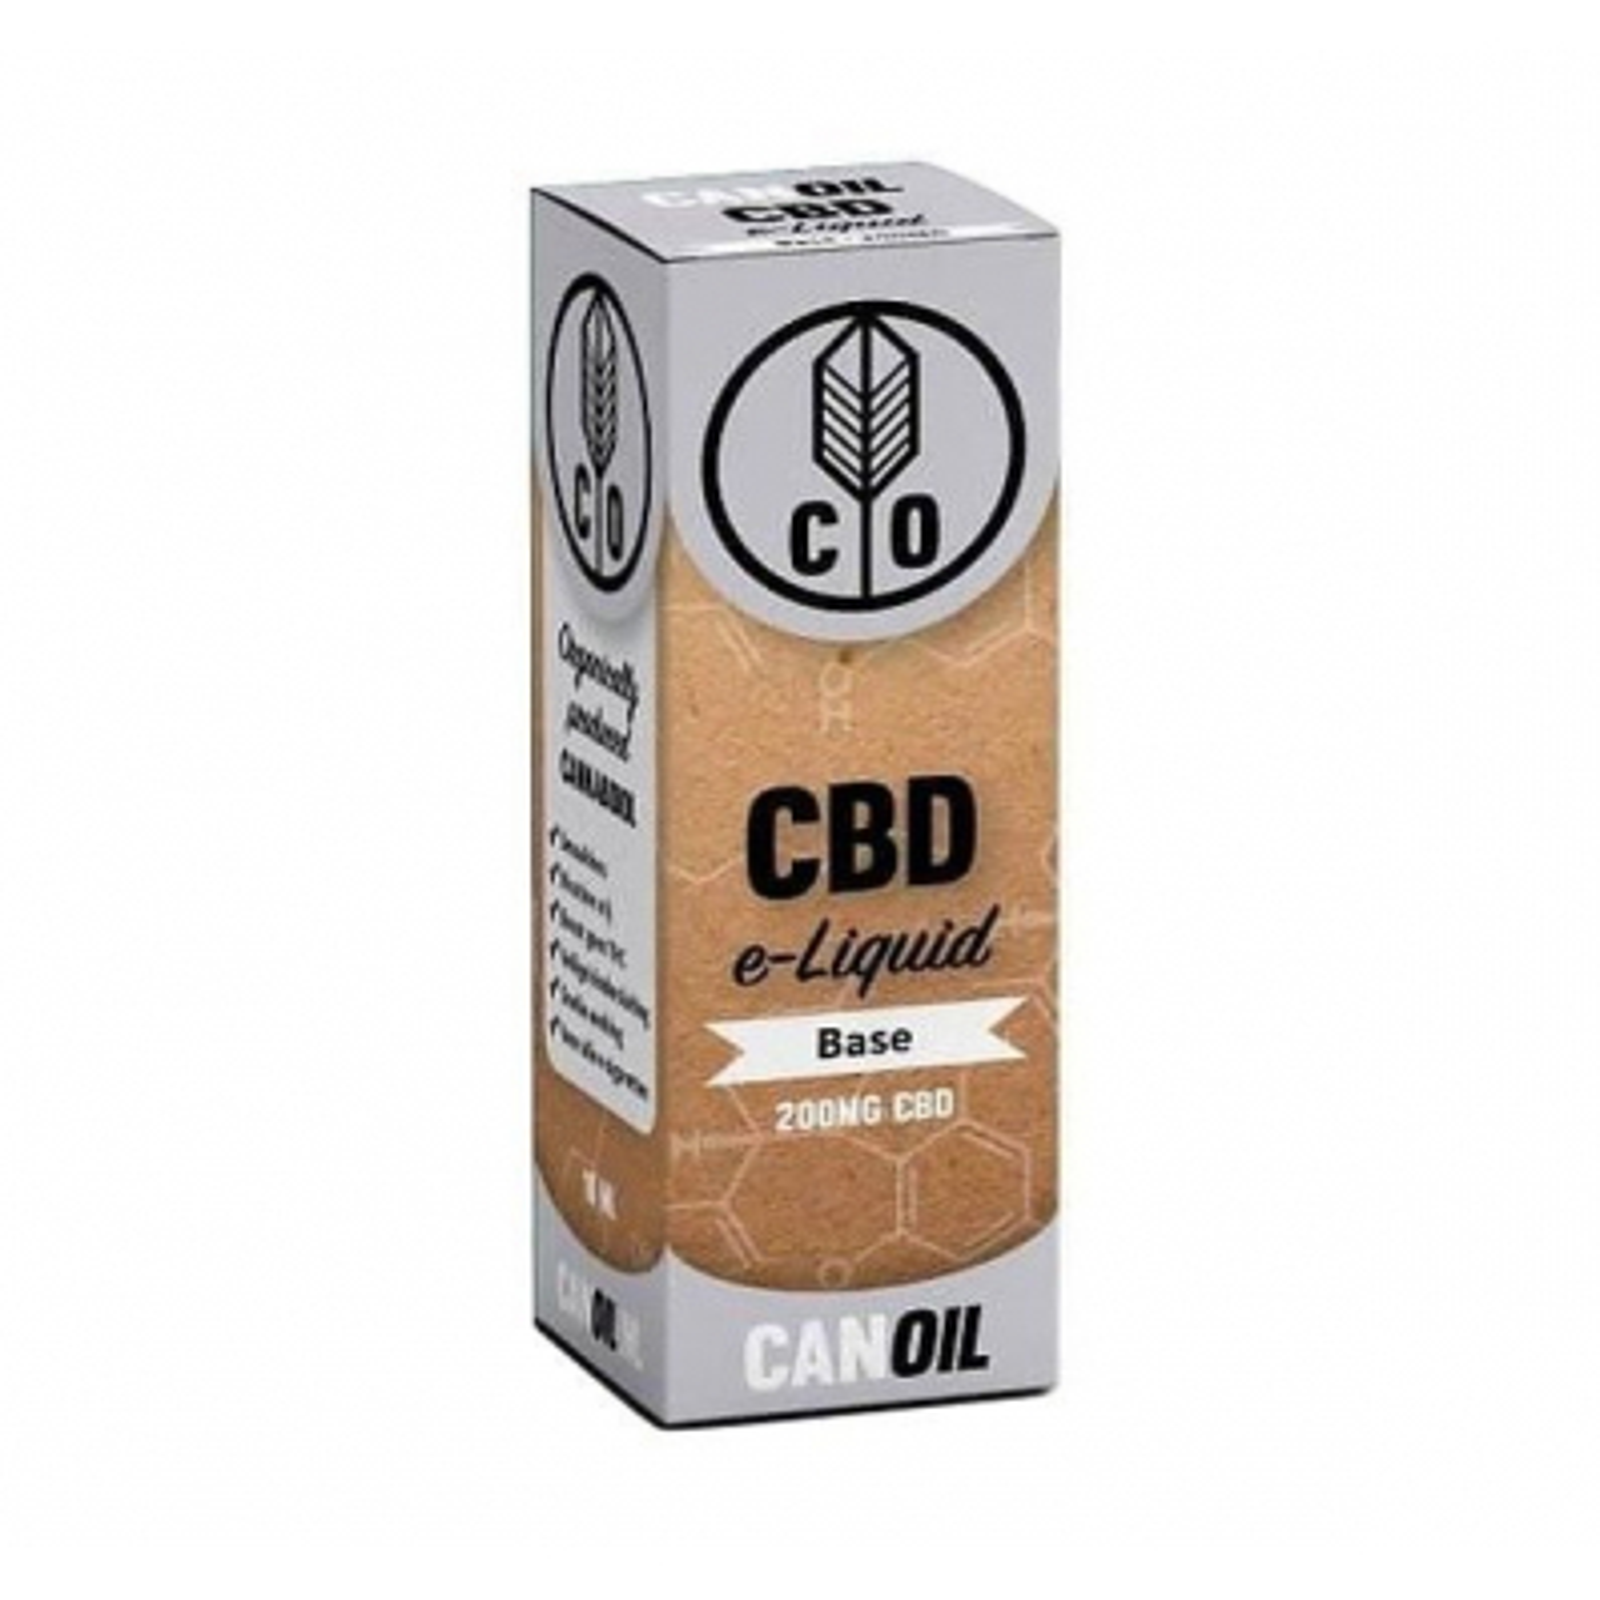 Base CanOil CBD